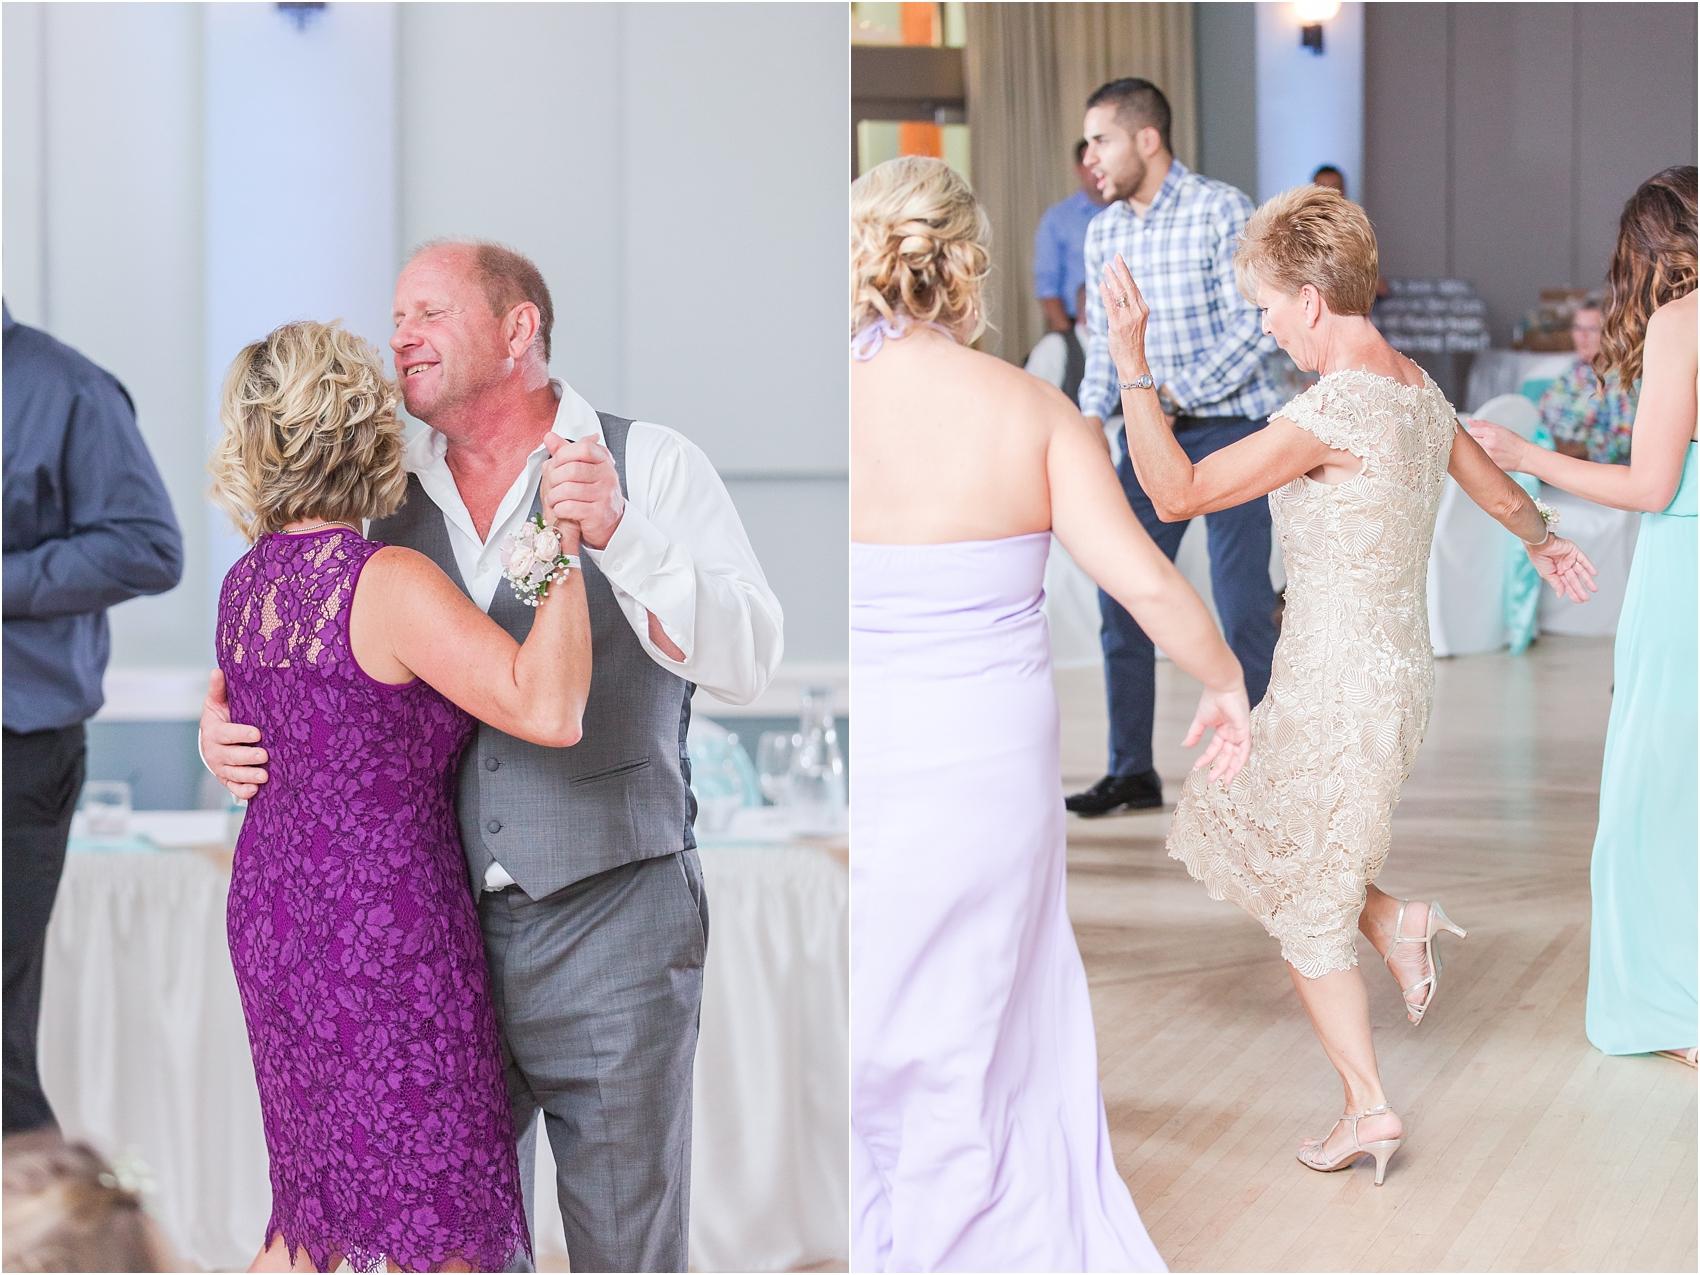 fun-whimsical-beach-wedding-photos-in-st-joseph-michigan-by-courtney-carolyn-photography_0096.jpg